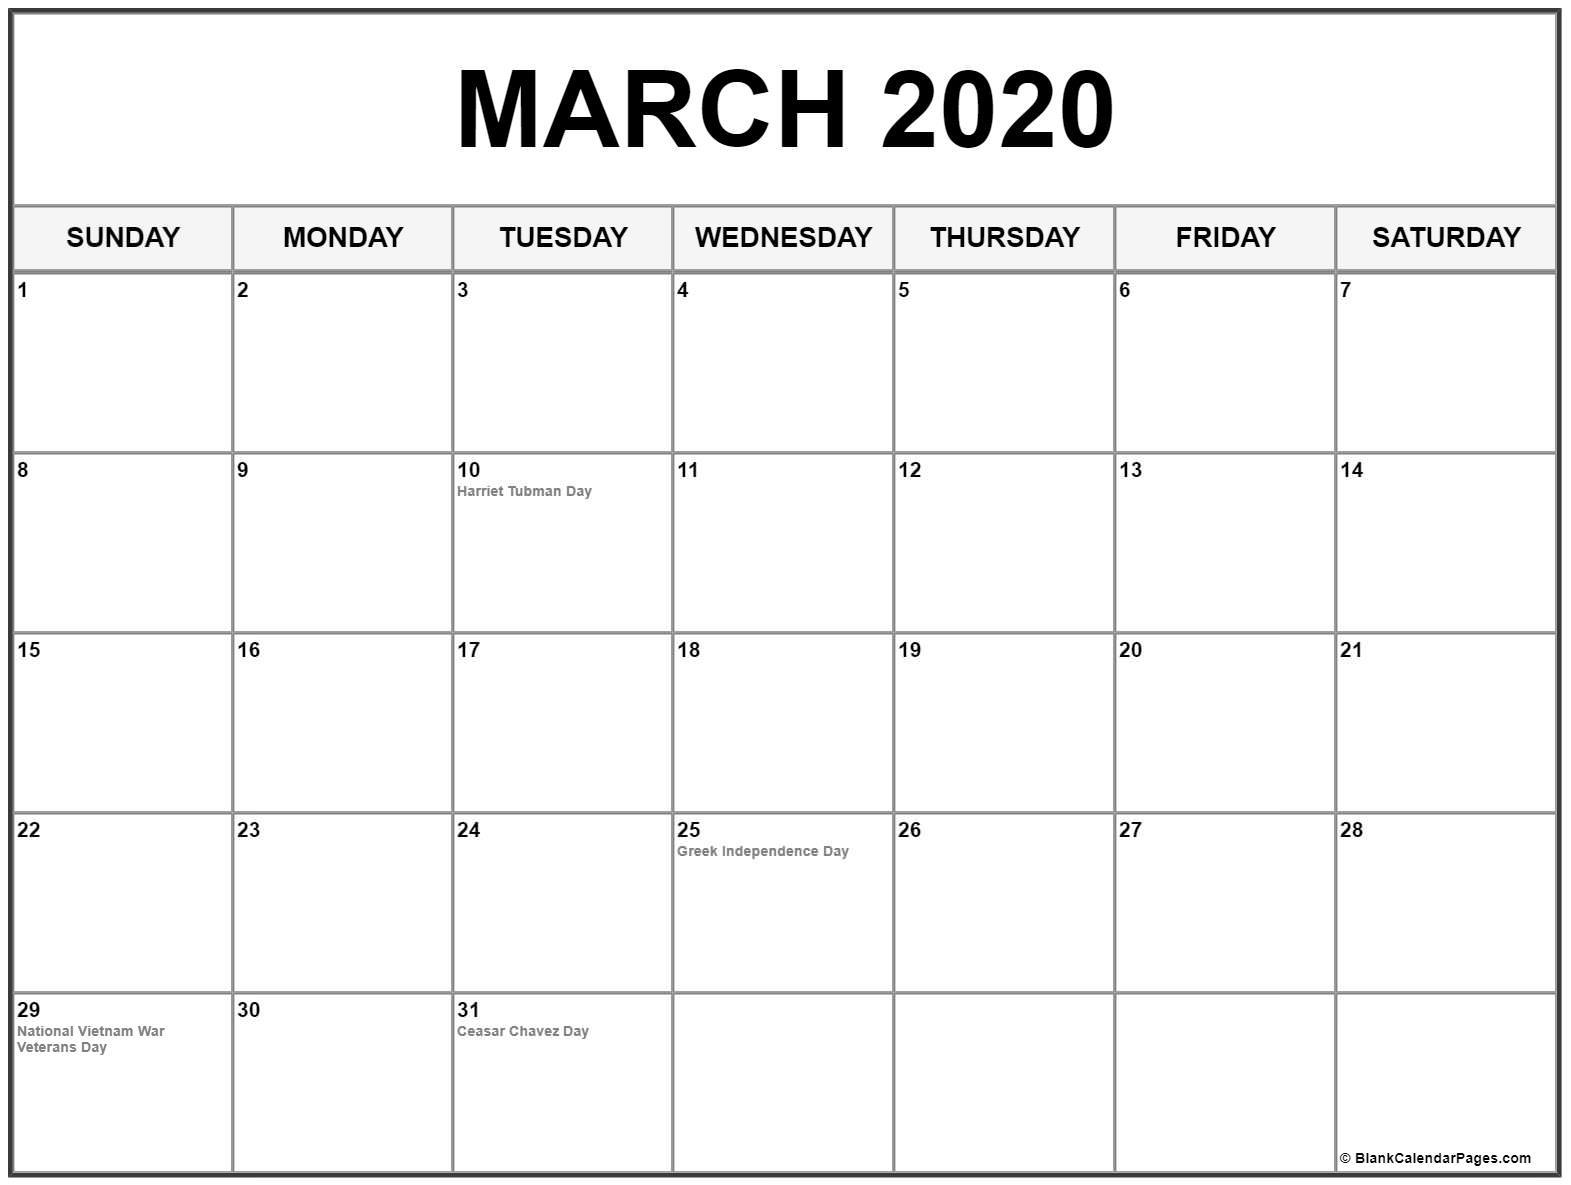 March 2020 Calendar With Holidays   Printable Calendar 2020 Calendar Of Holidays